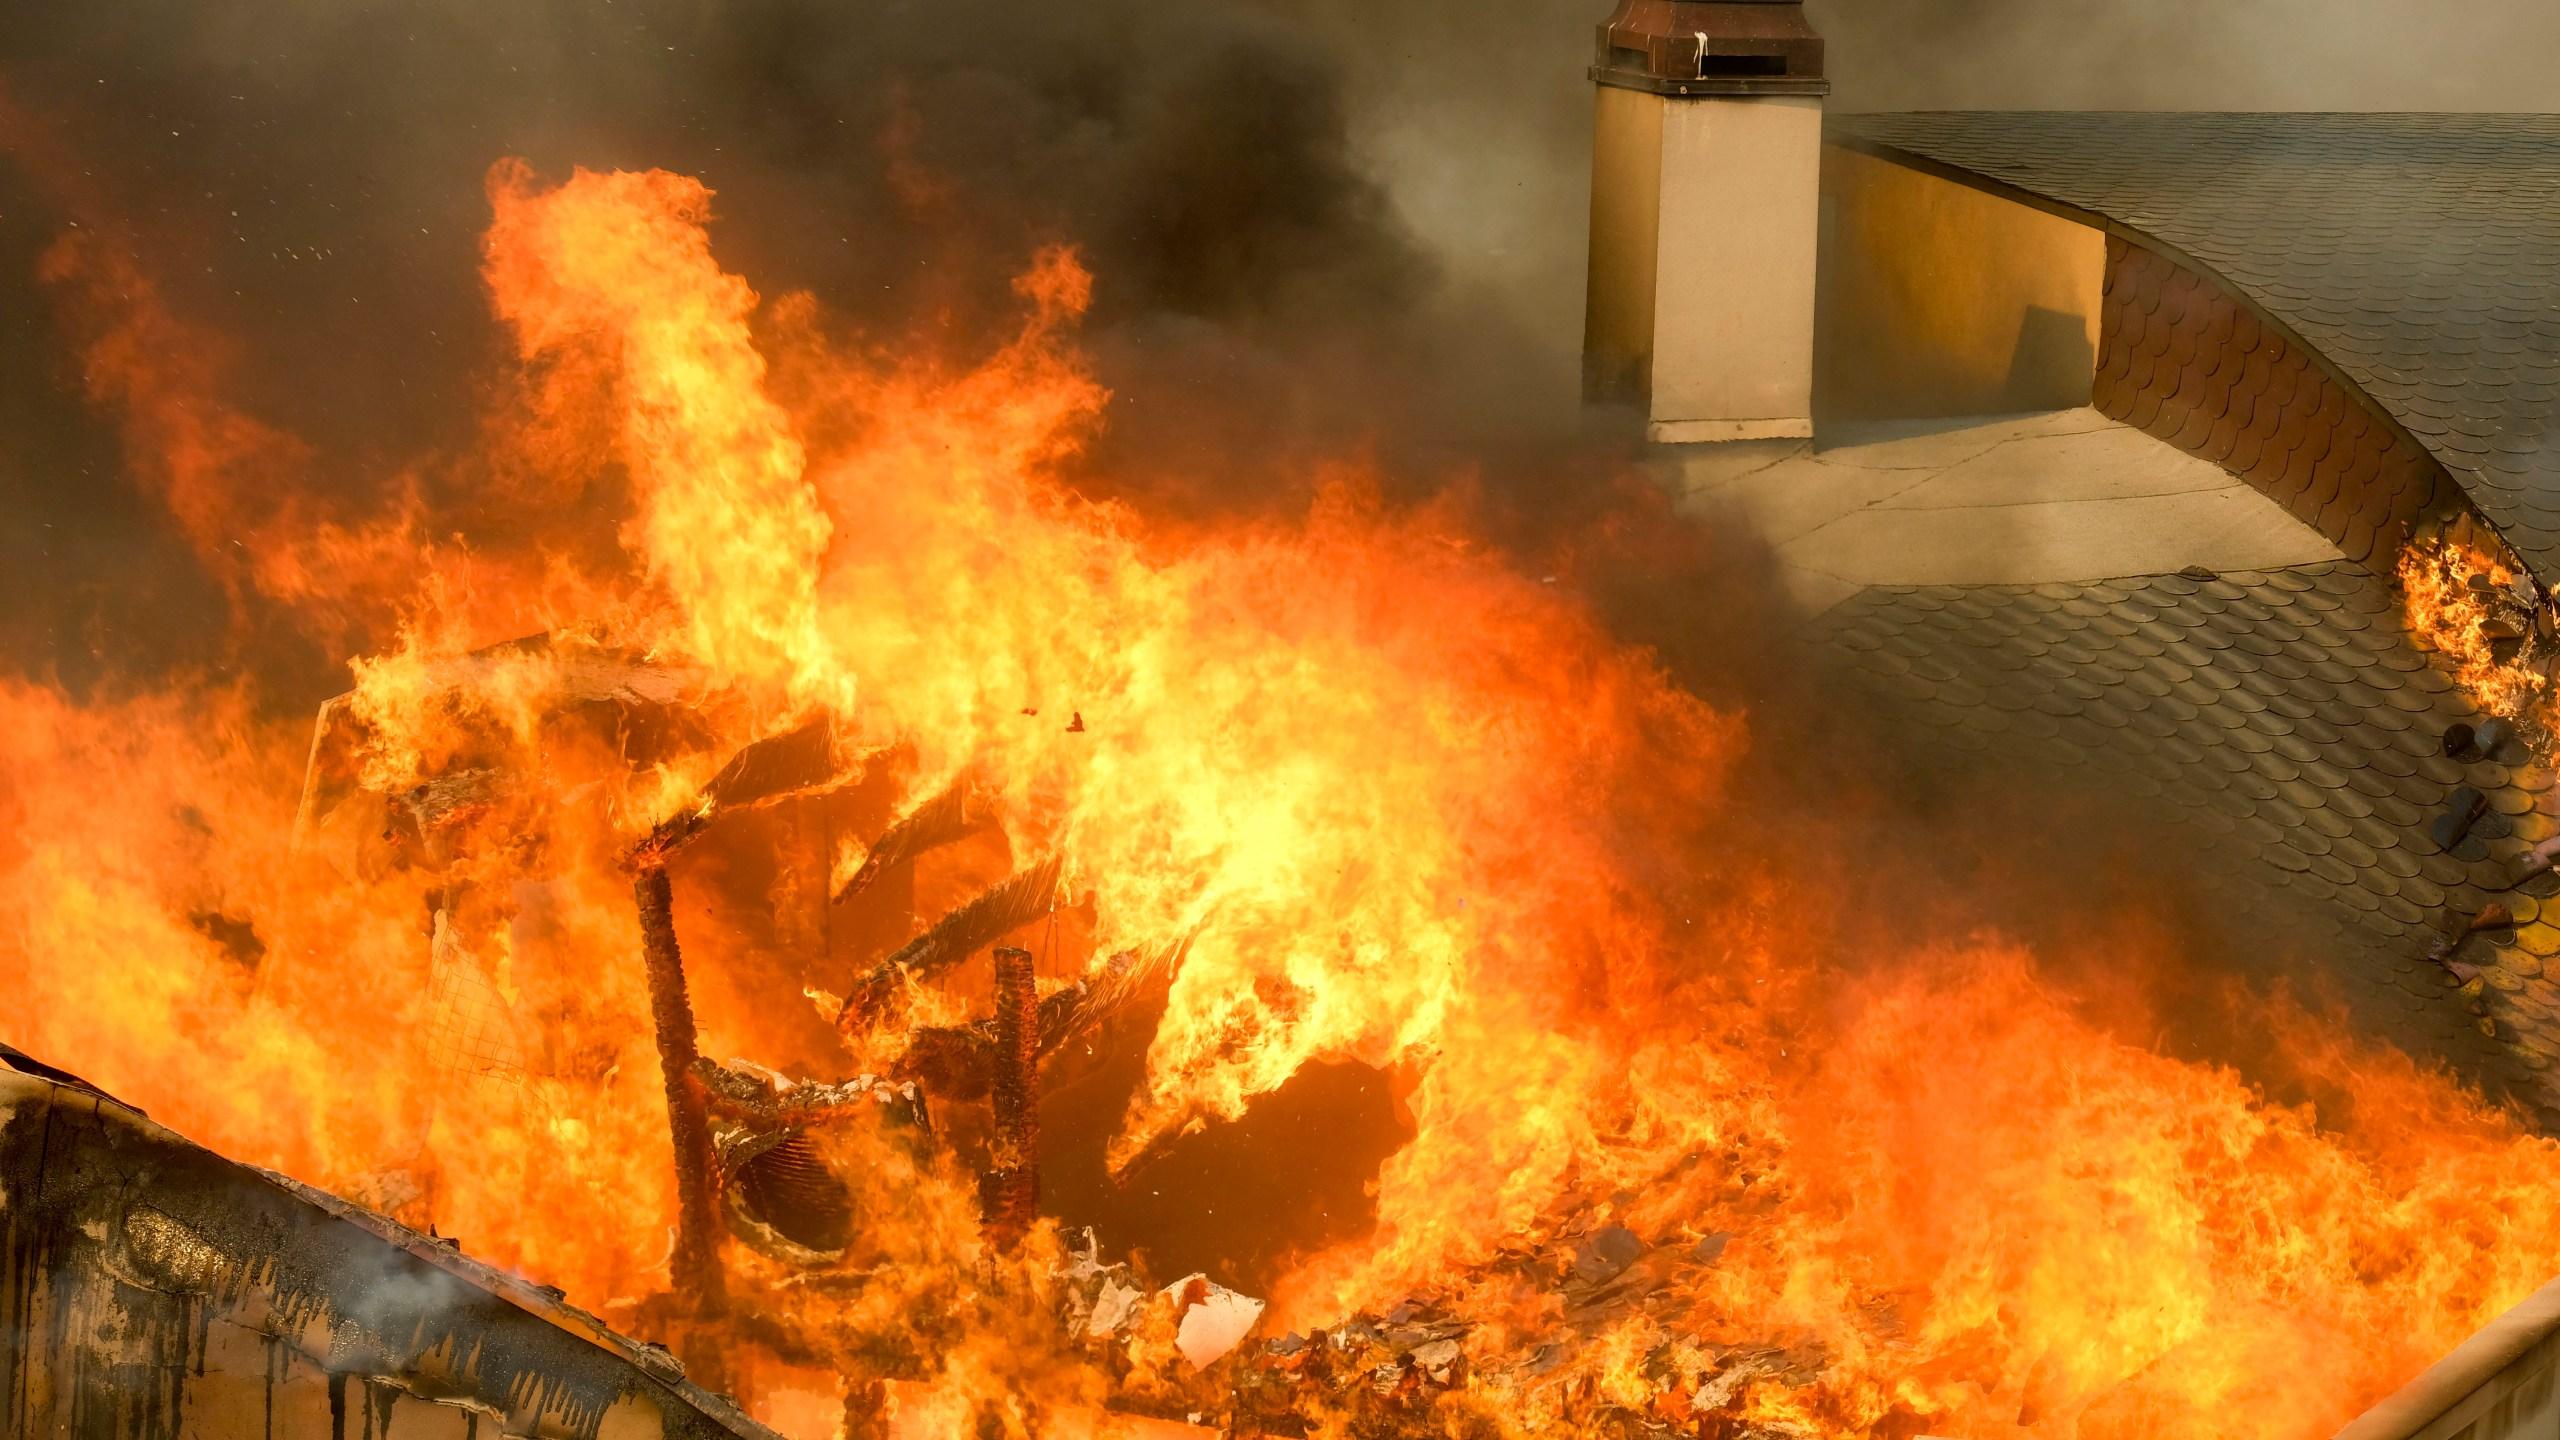 California_Wildfires_31736-159532.jpg06374541